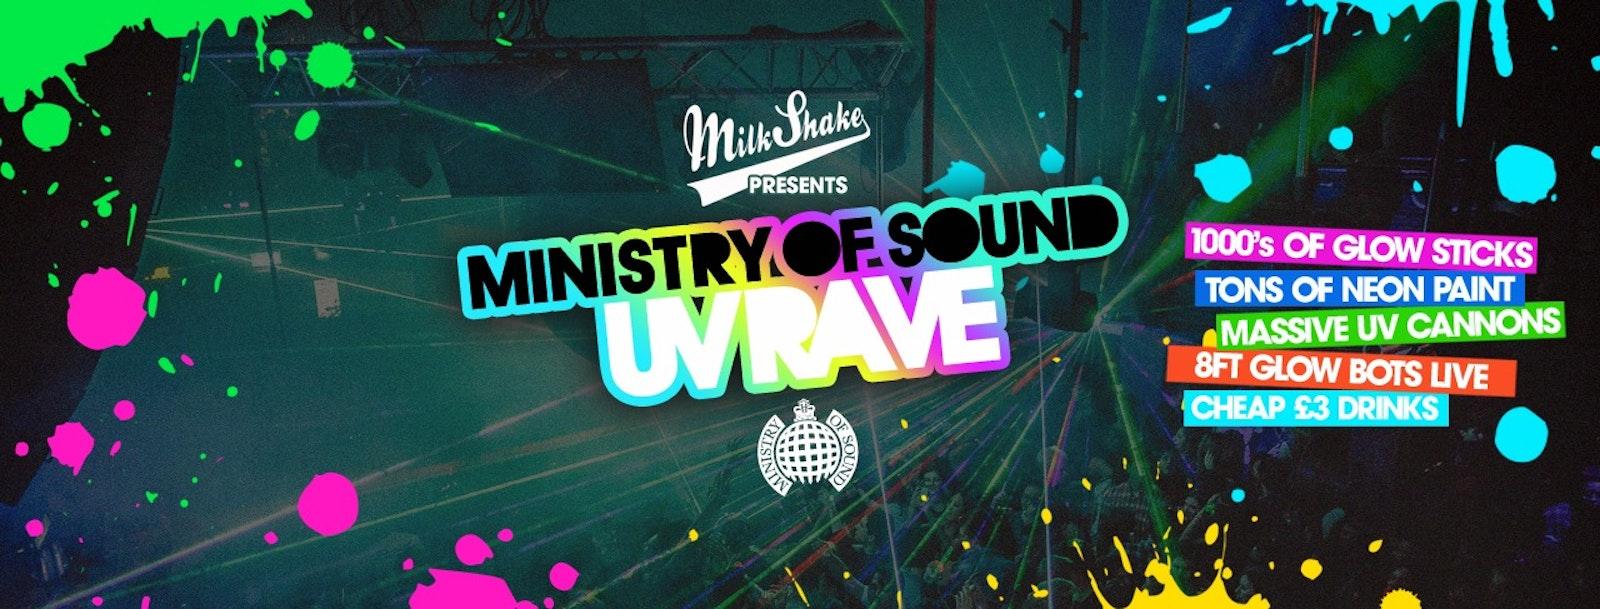 Milkshake, Ministry of Sound | Official UV Rave 2020 ⚡